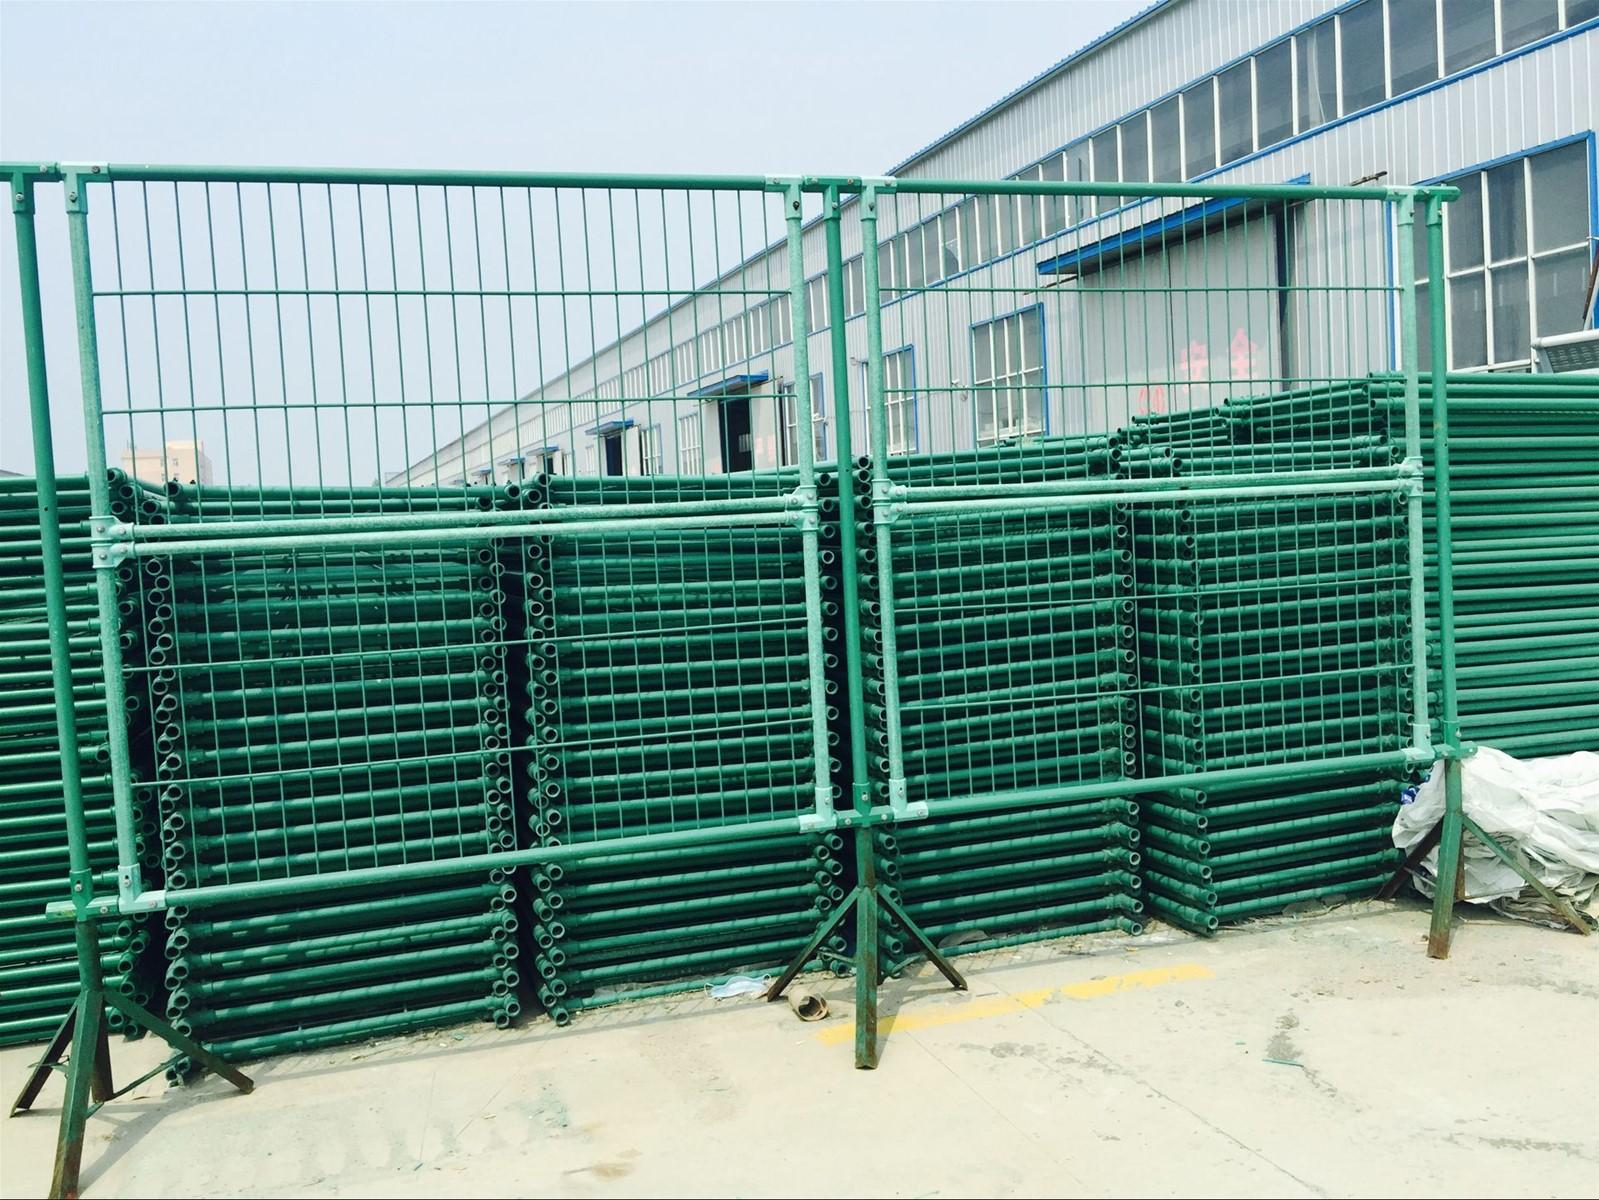 Fiberglass Fencing Products : Fiberglass reinforced plastic fence supply purchasing